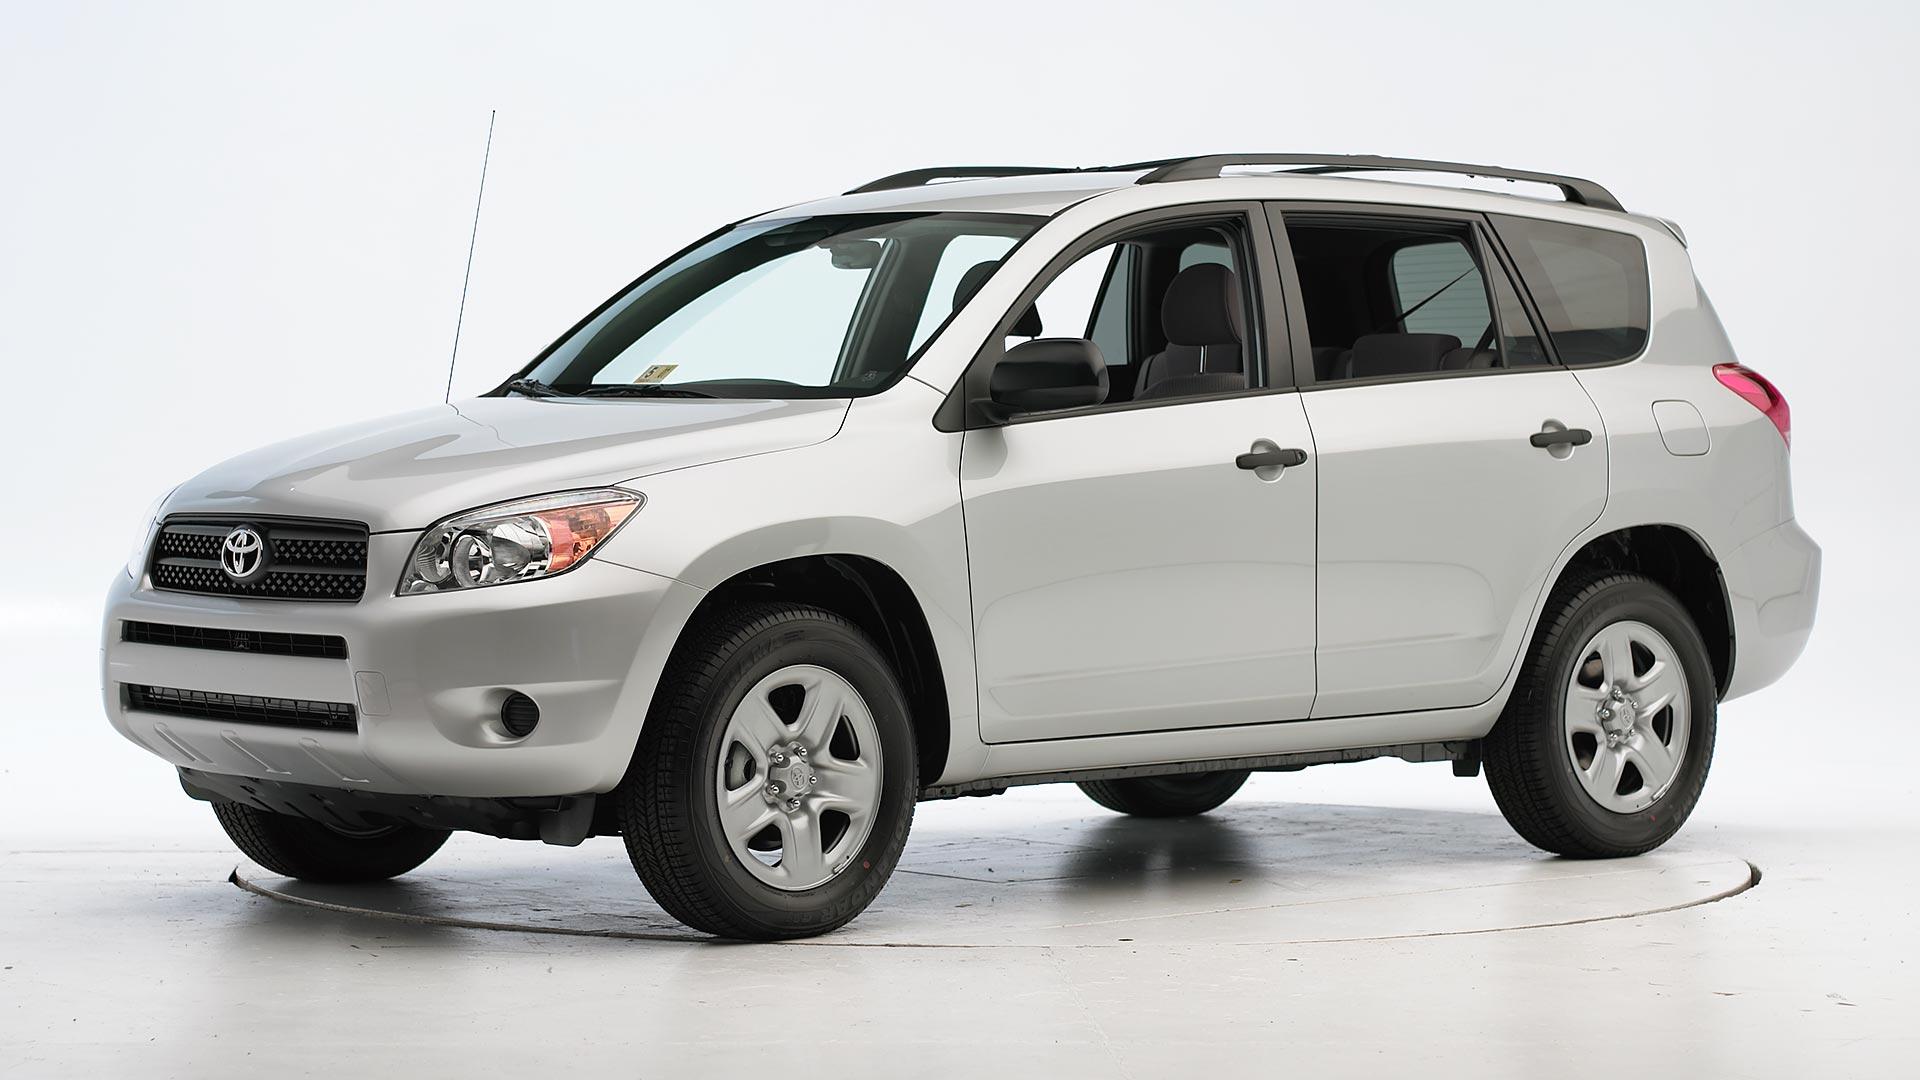 Kelebihan Toyota 2007 Tangguh